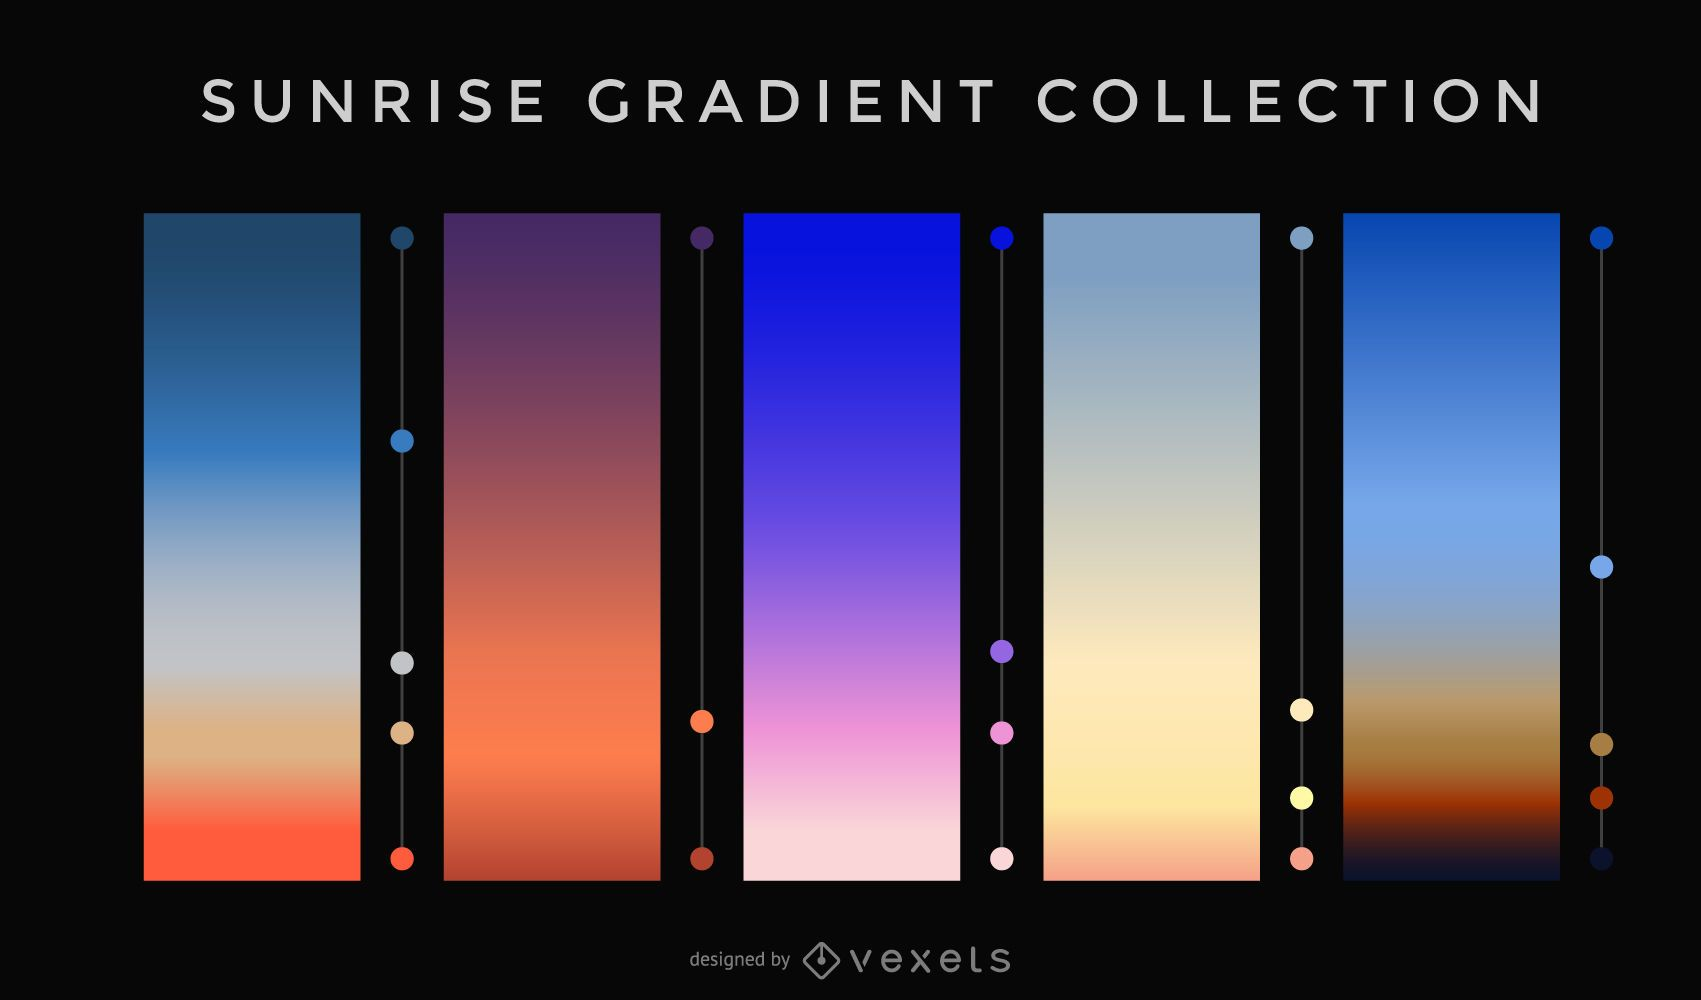 Sunrise gradient collection